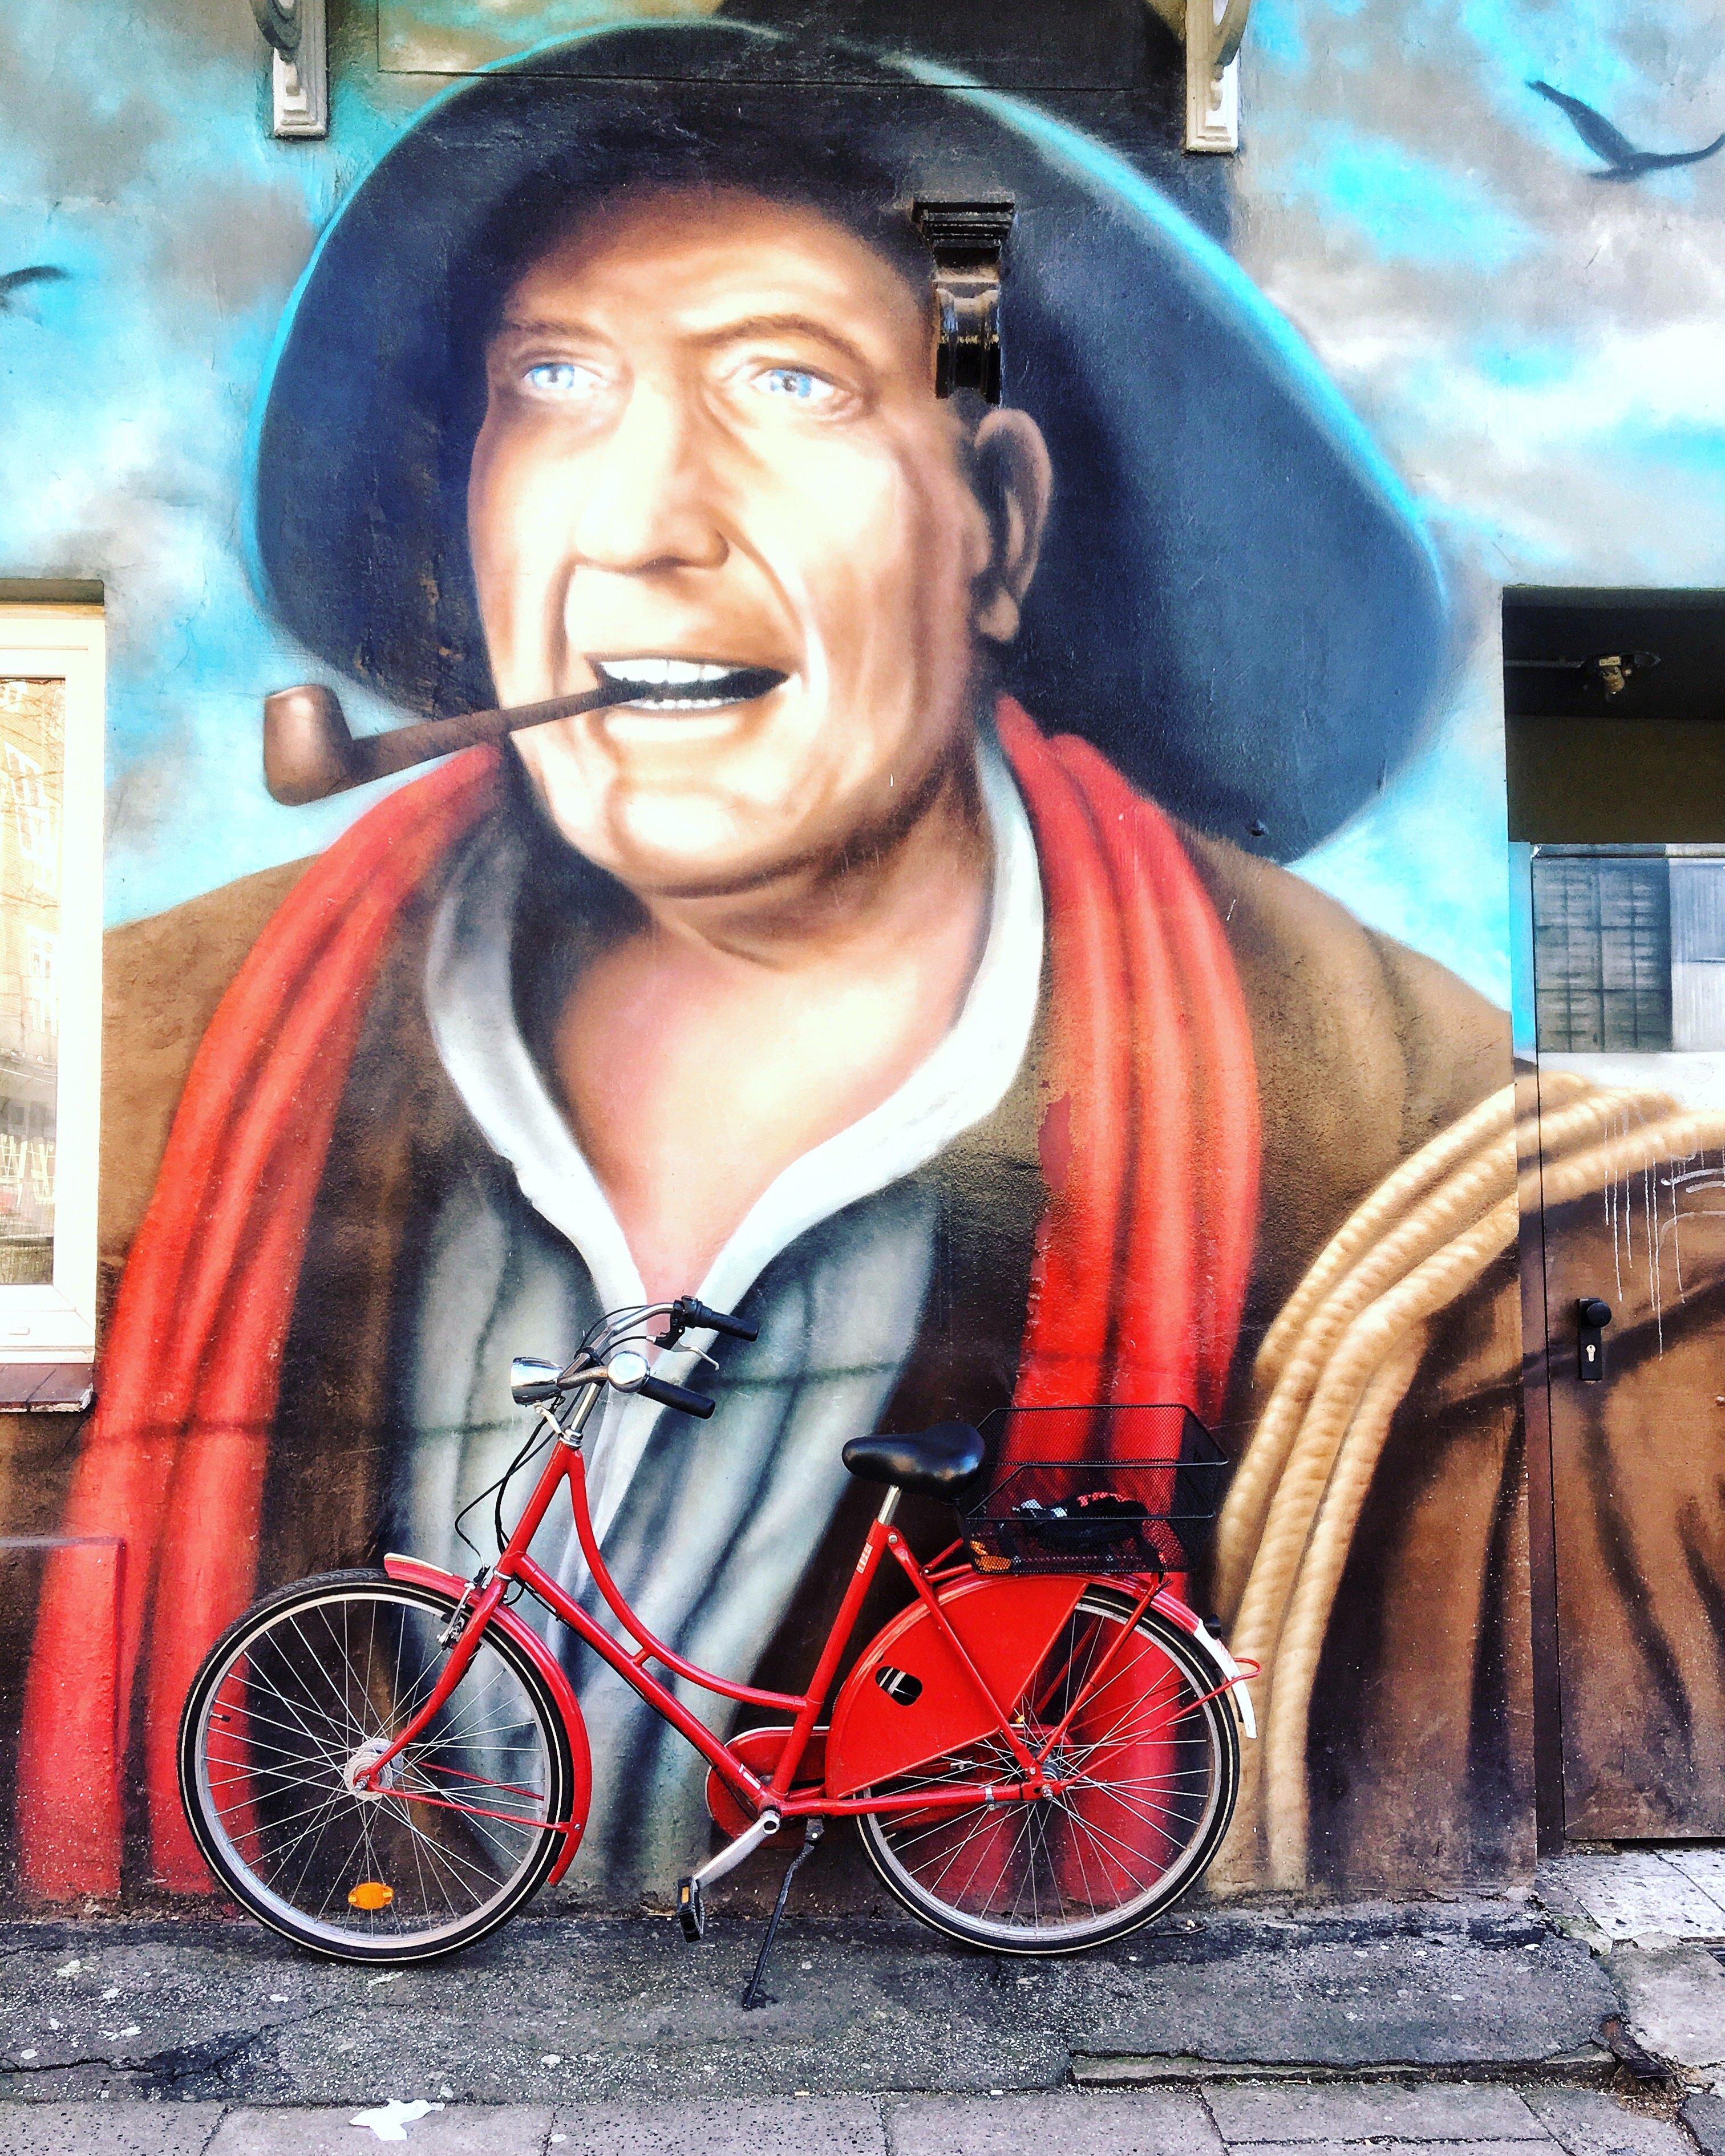 Streetart Hamburg: Hans Albers Graffiti St. Pauli Frau Elbville Hamburg Companion